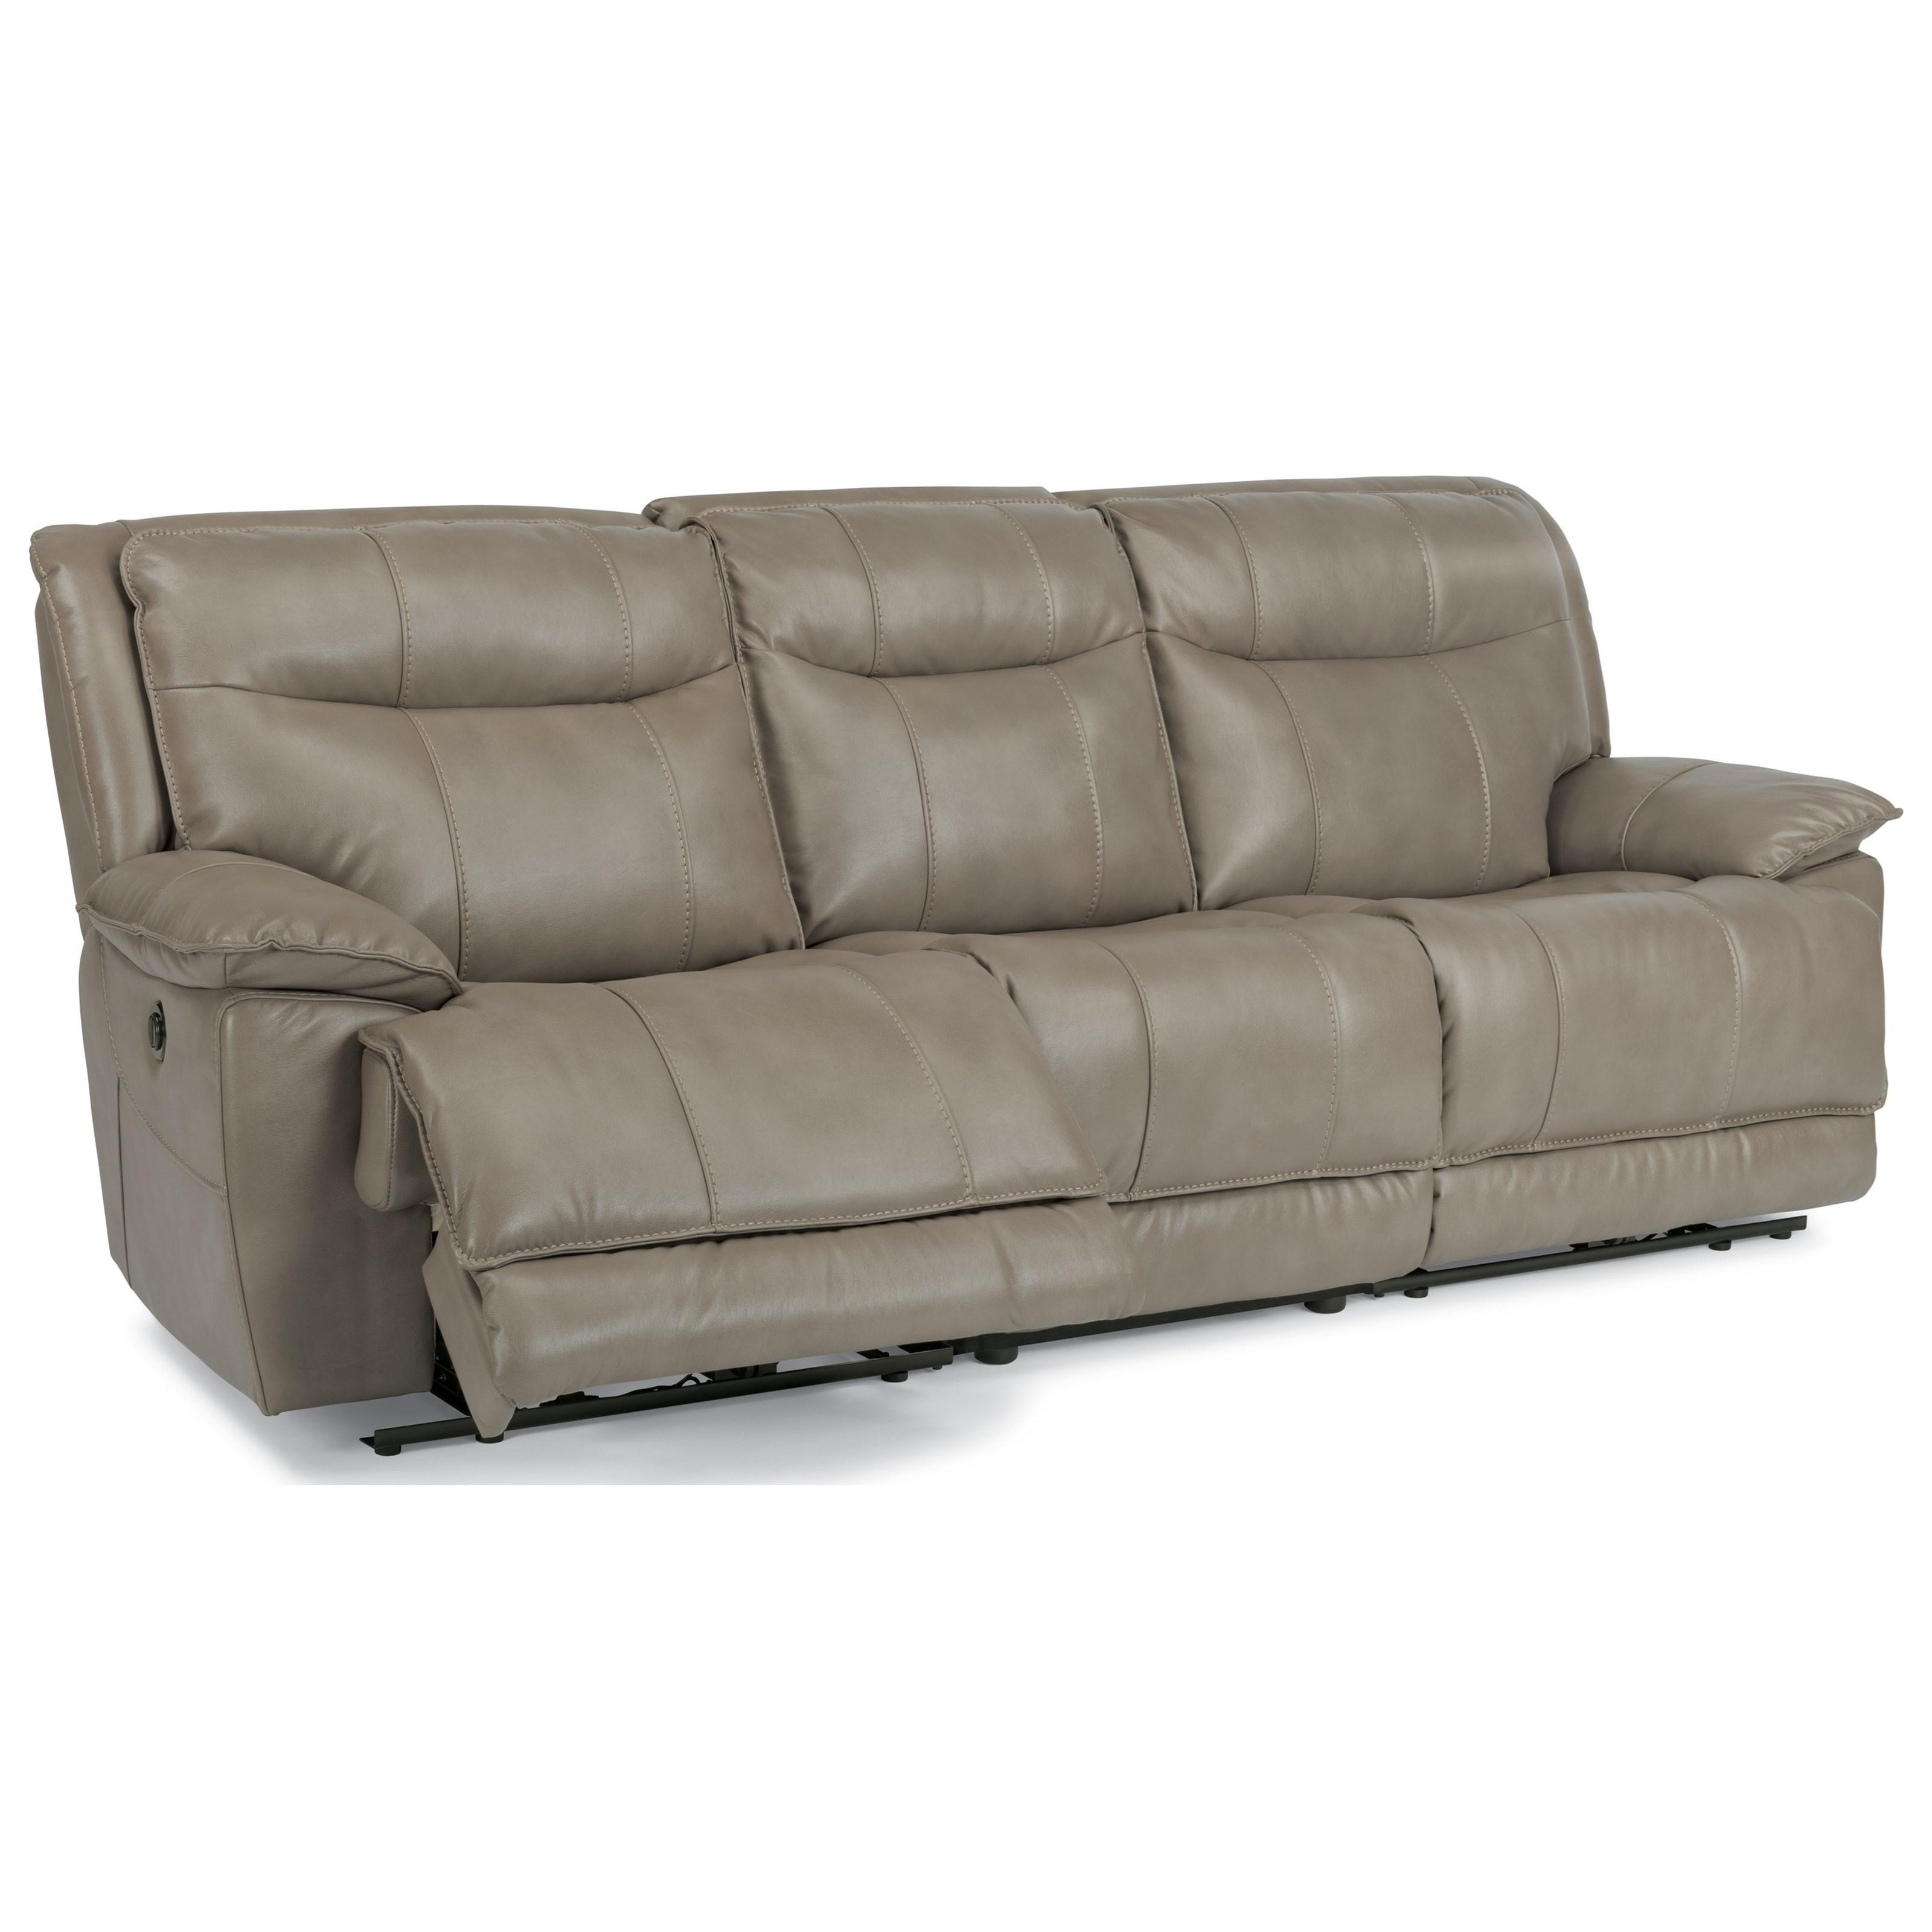 Flexsteel Latitudes Bliss Power Reclining Sofa   Item Number: 1730 62P